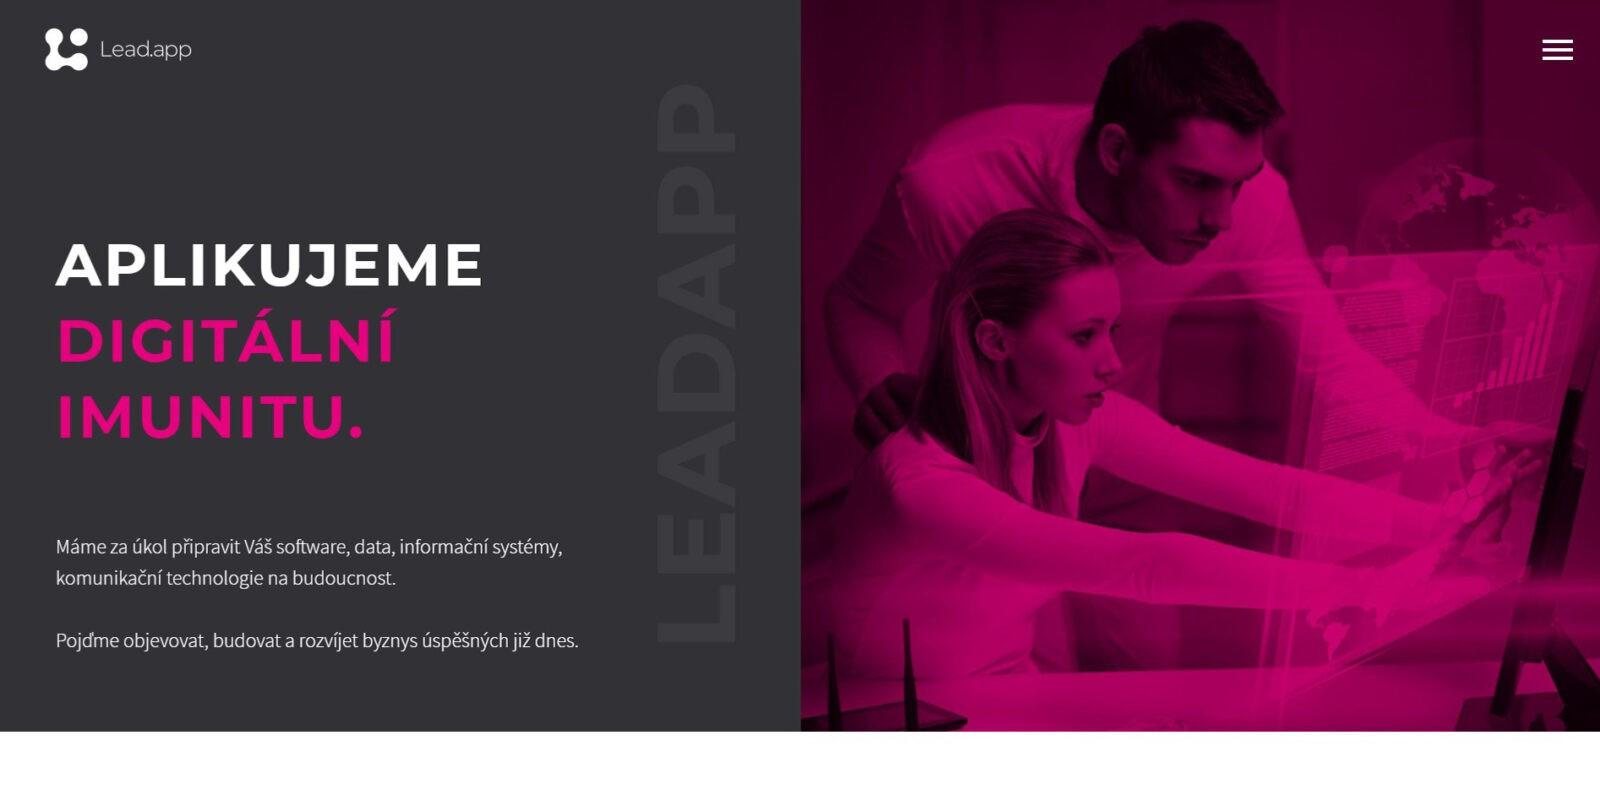 Lead.app